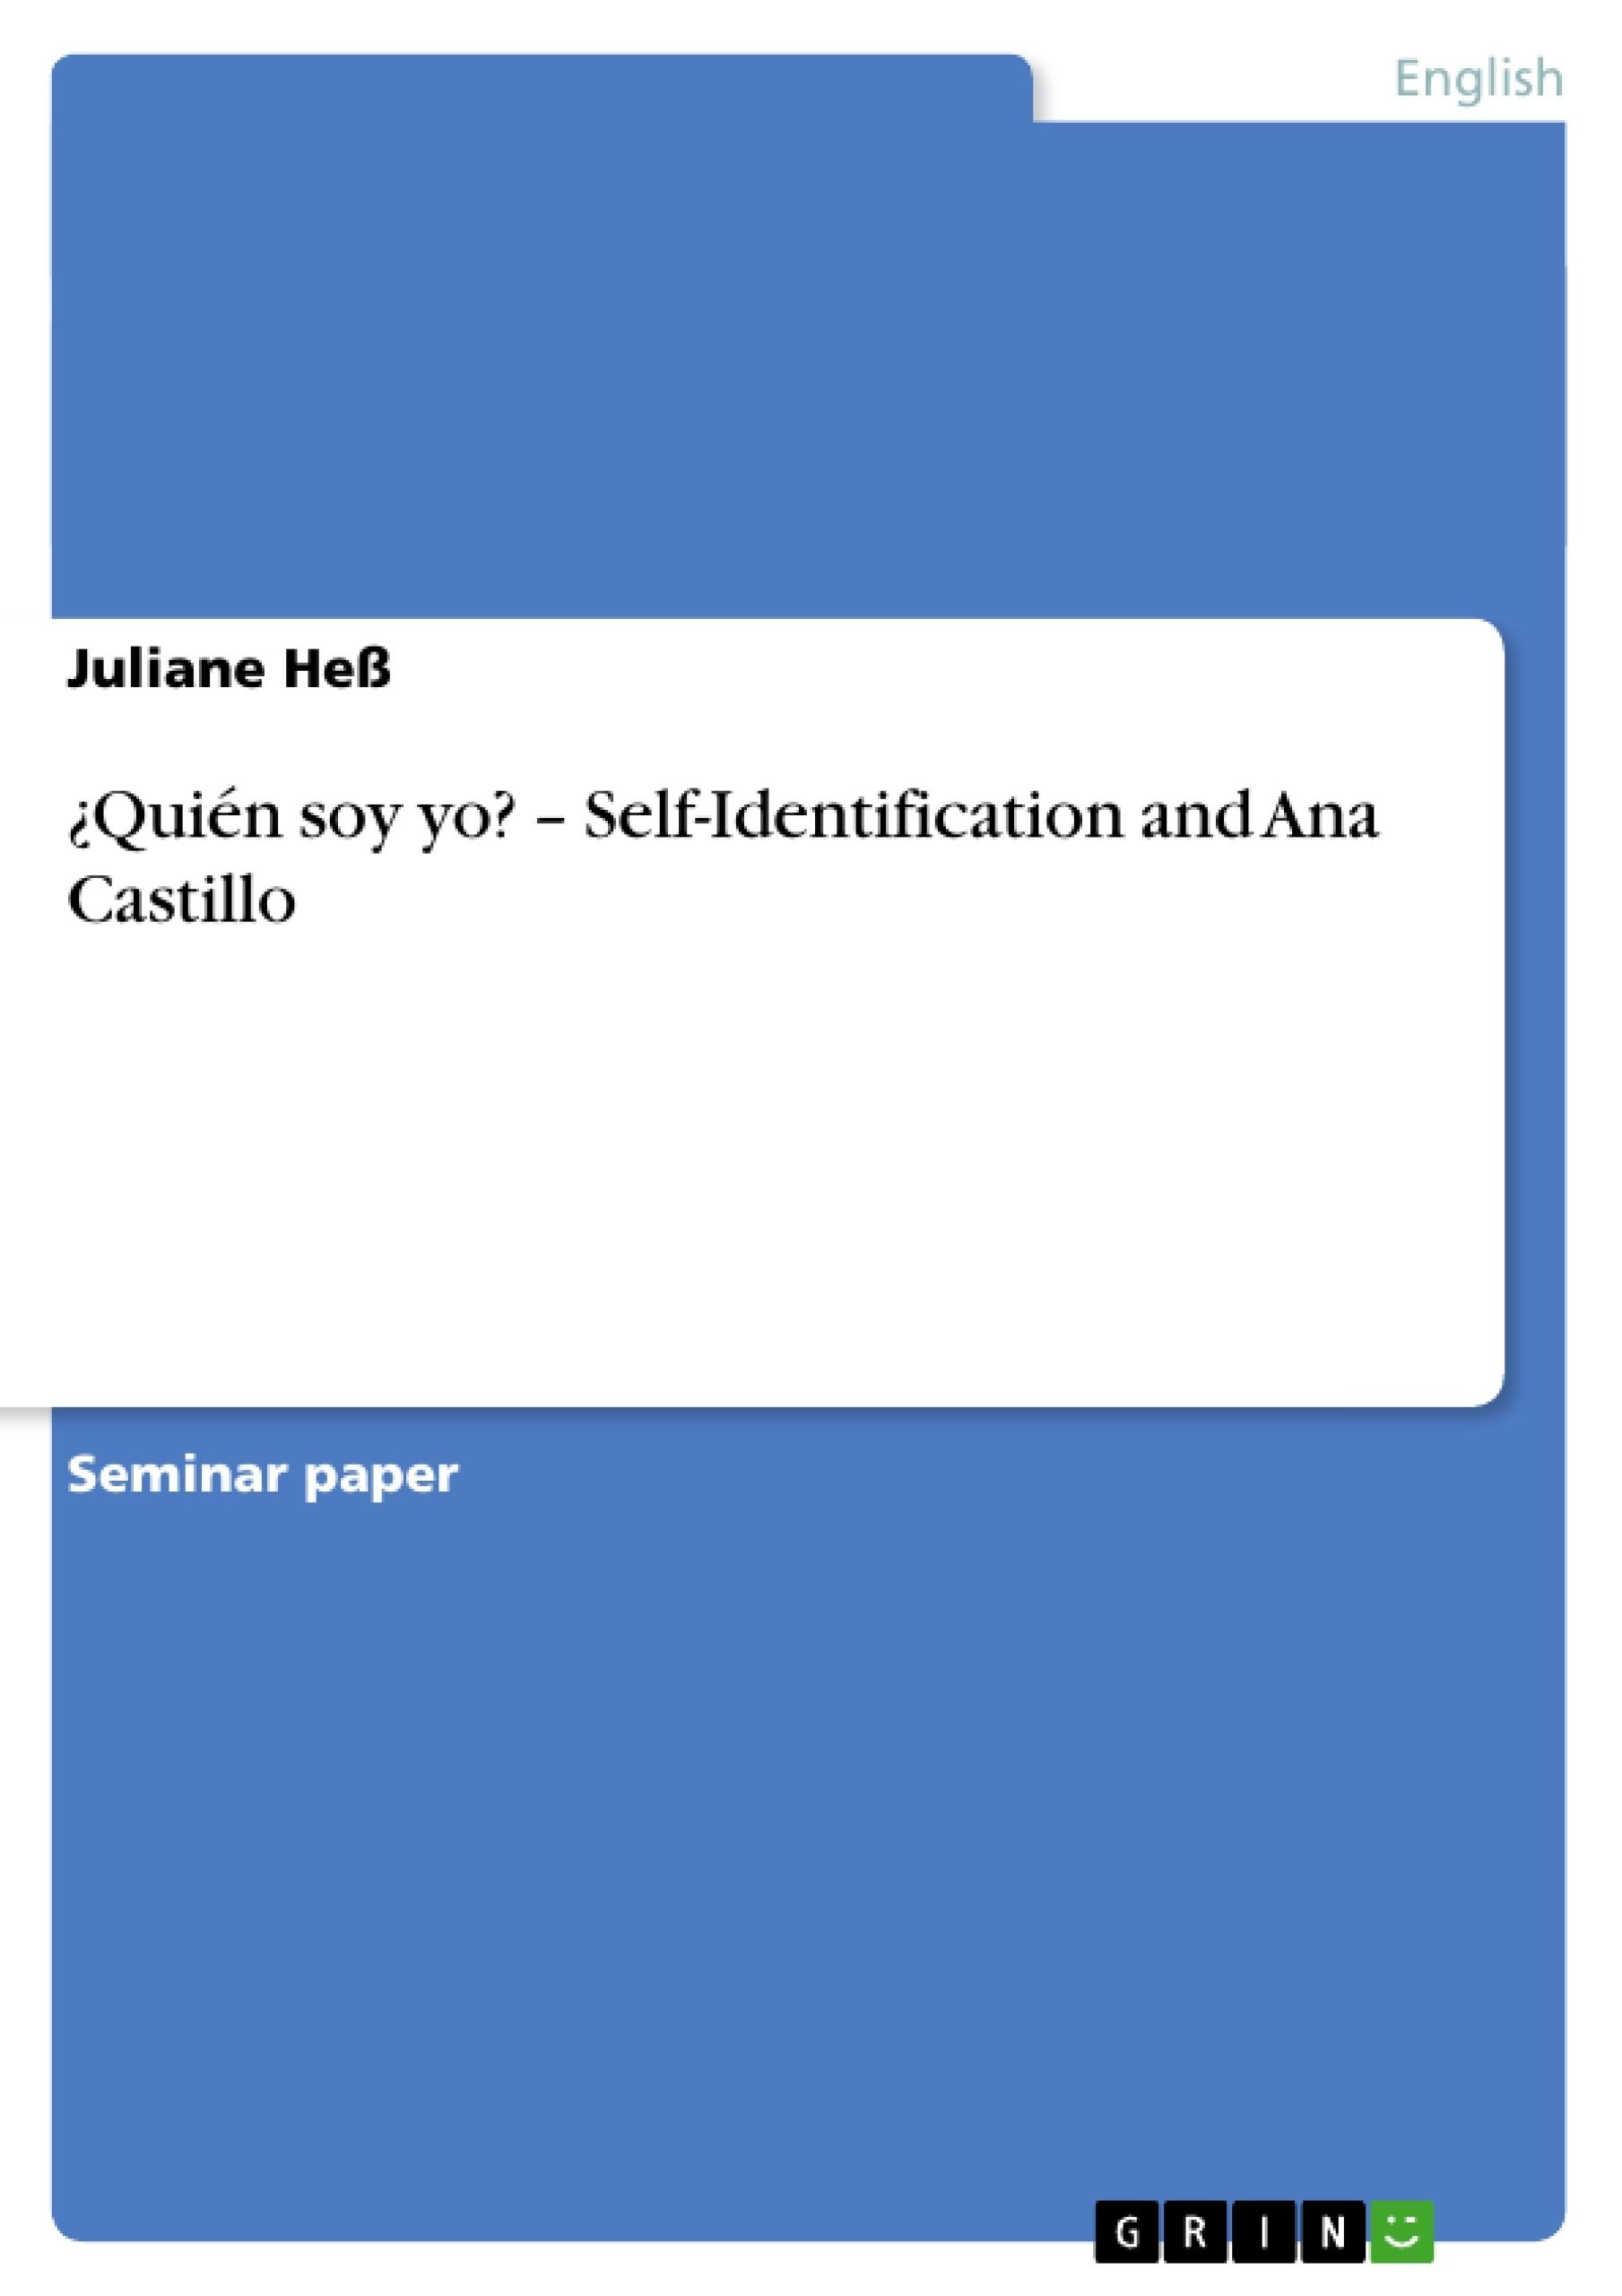 Title: ¿Quién soy yo? – Self-Identification and Ana Castillo